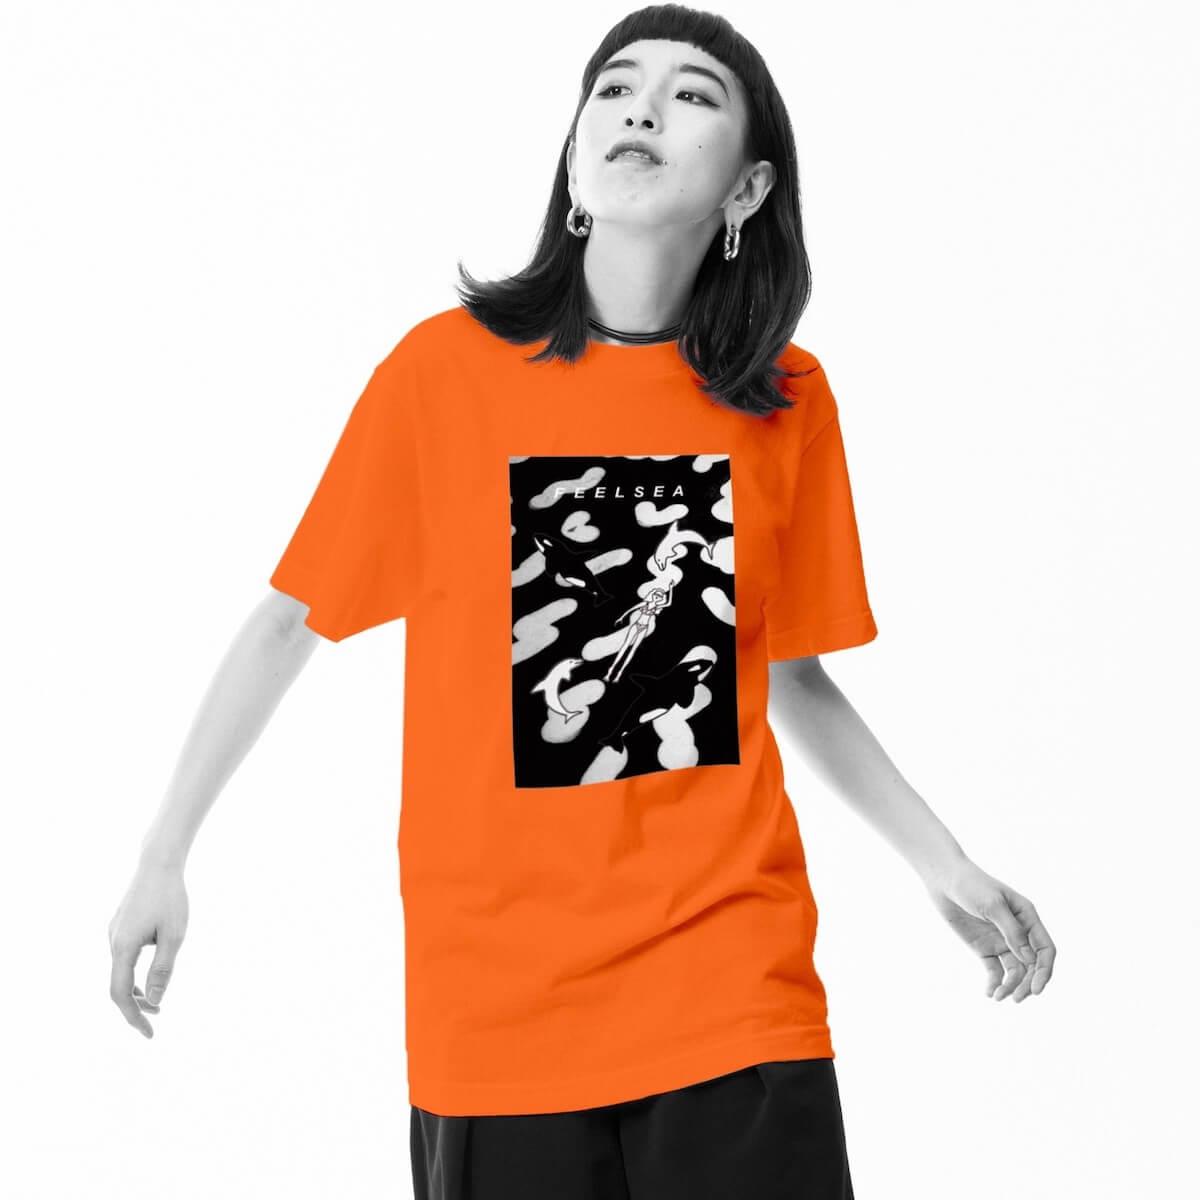 "<THE M/ALL>、""100 VOTE T−Shirts PROJECT""の第四弾マヒトゥ・ザ・ピーポーとのコラボTシャツ全9種類が販売開始! musix190520the-m-all_6"